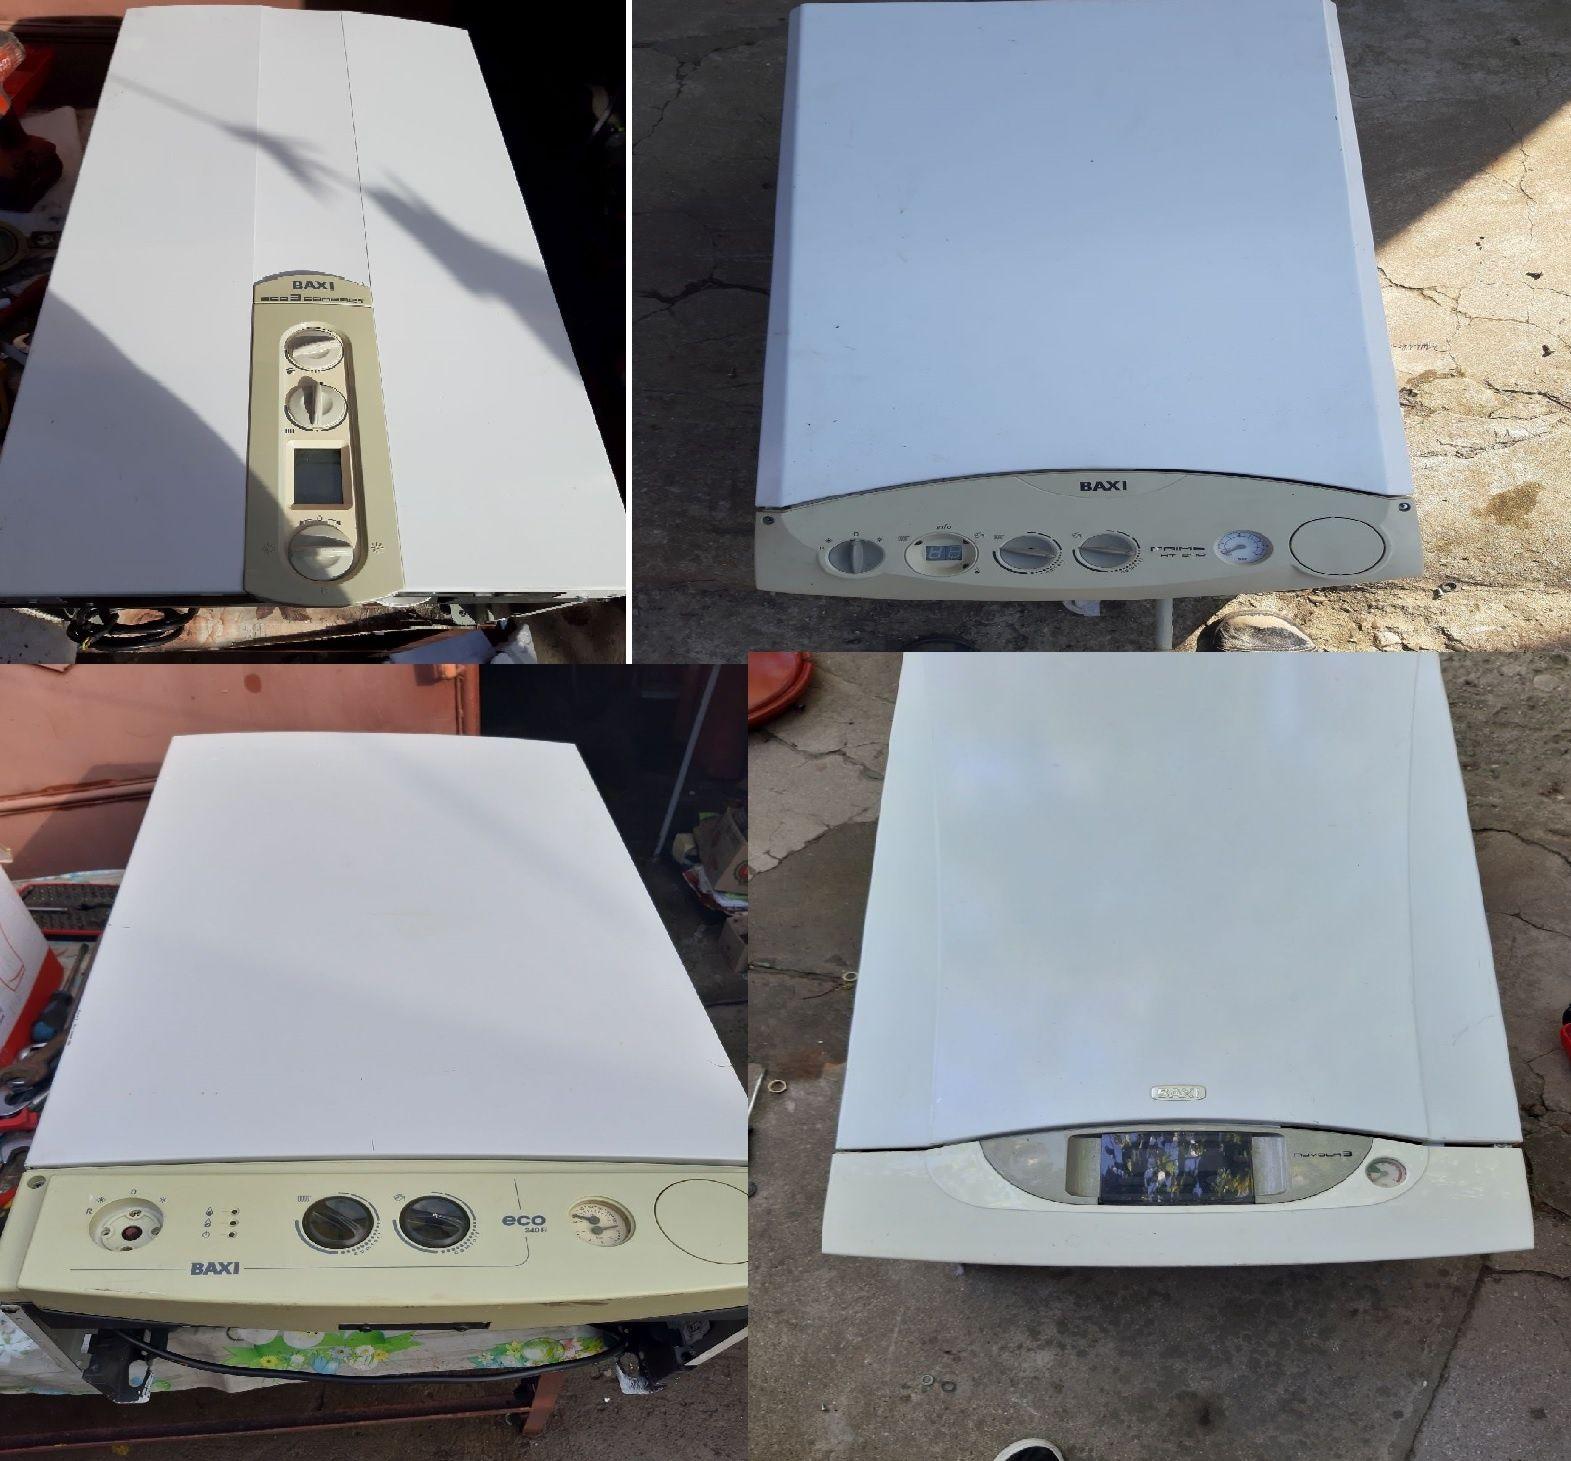 Dezmembrez centrale Baxi Prime HT 240 Fi Eco 3 Compact 240Fi Nuvola 3